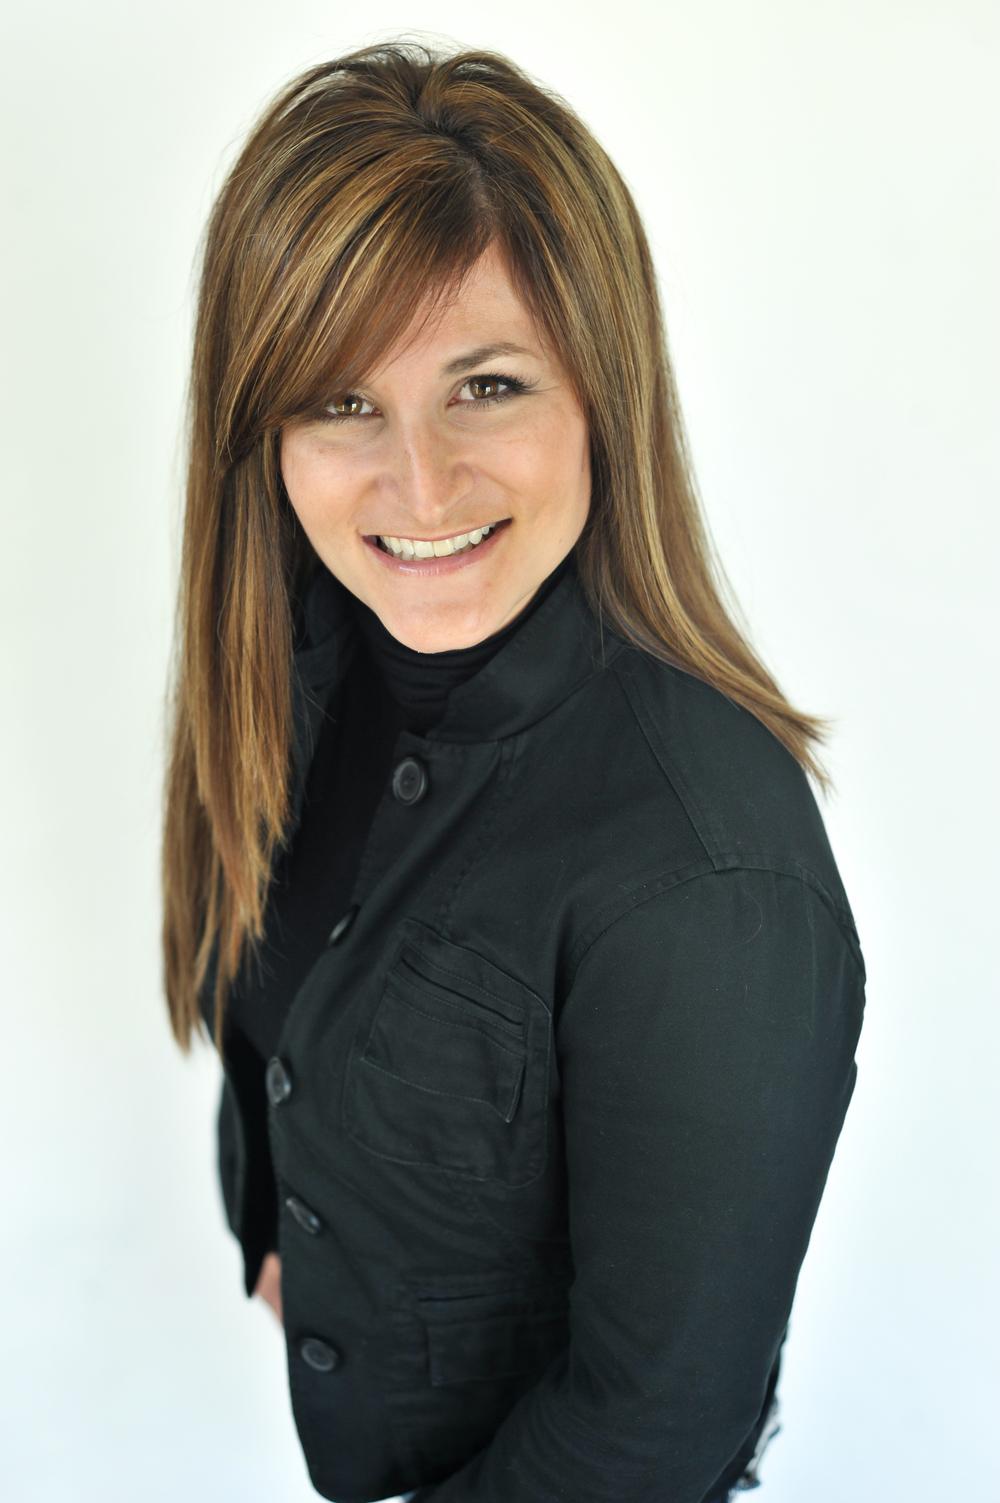 Gina Franklin